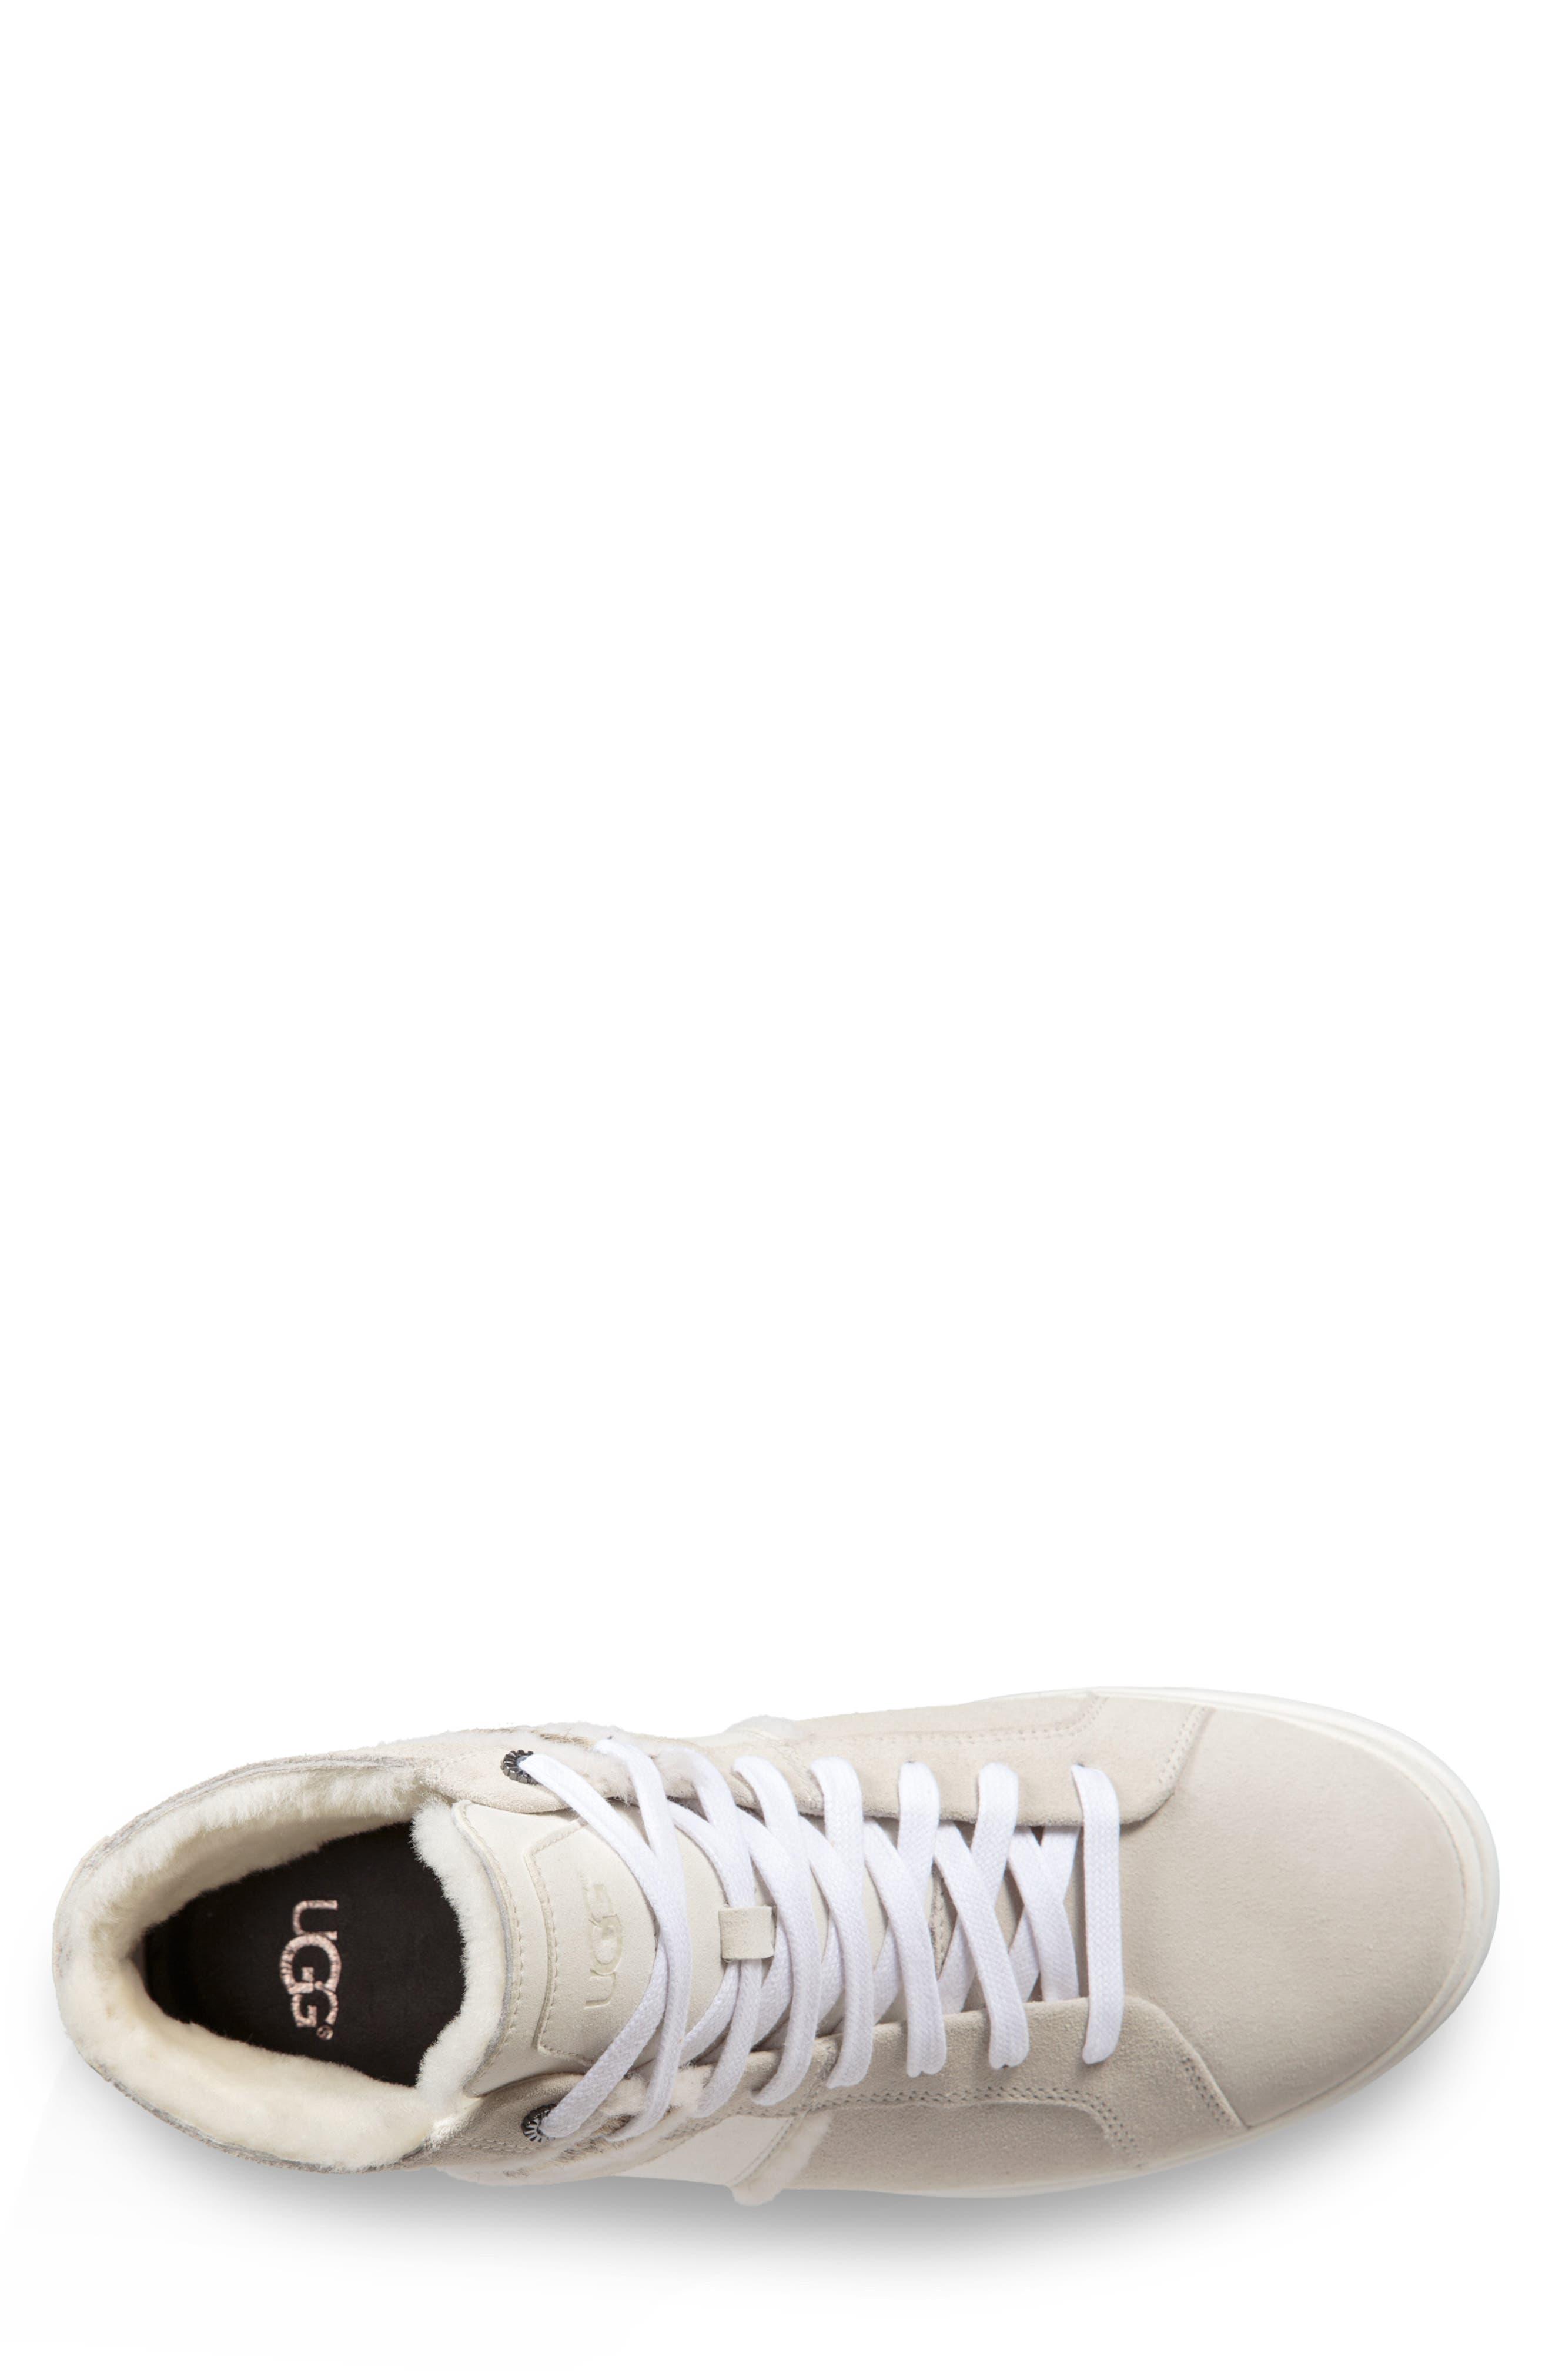 Cali High Top Sneaker,                             Alternate thumbnail 4, color,                             WHITE